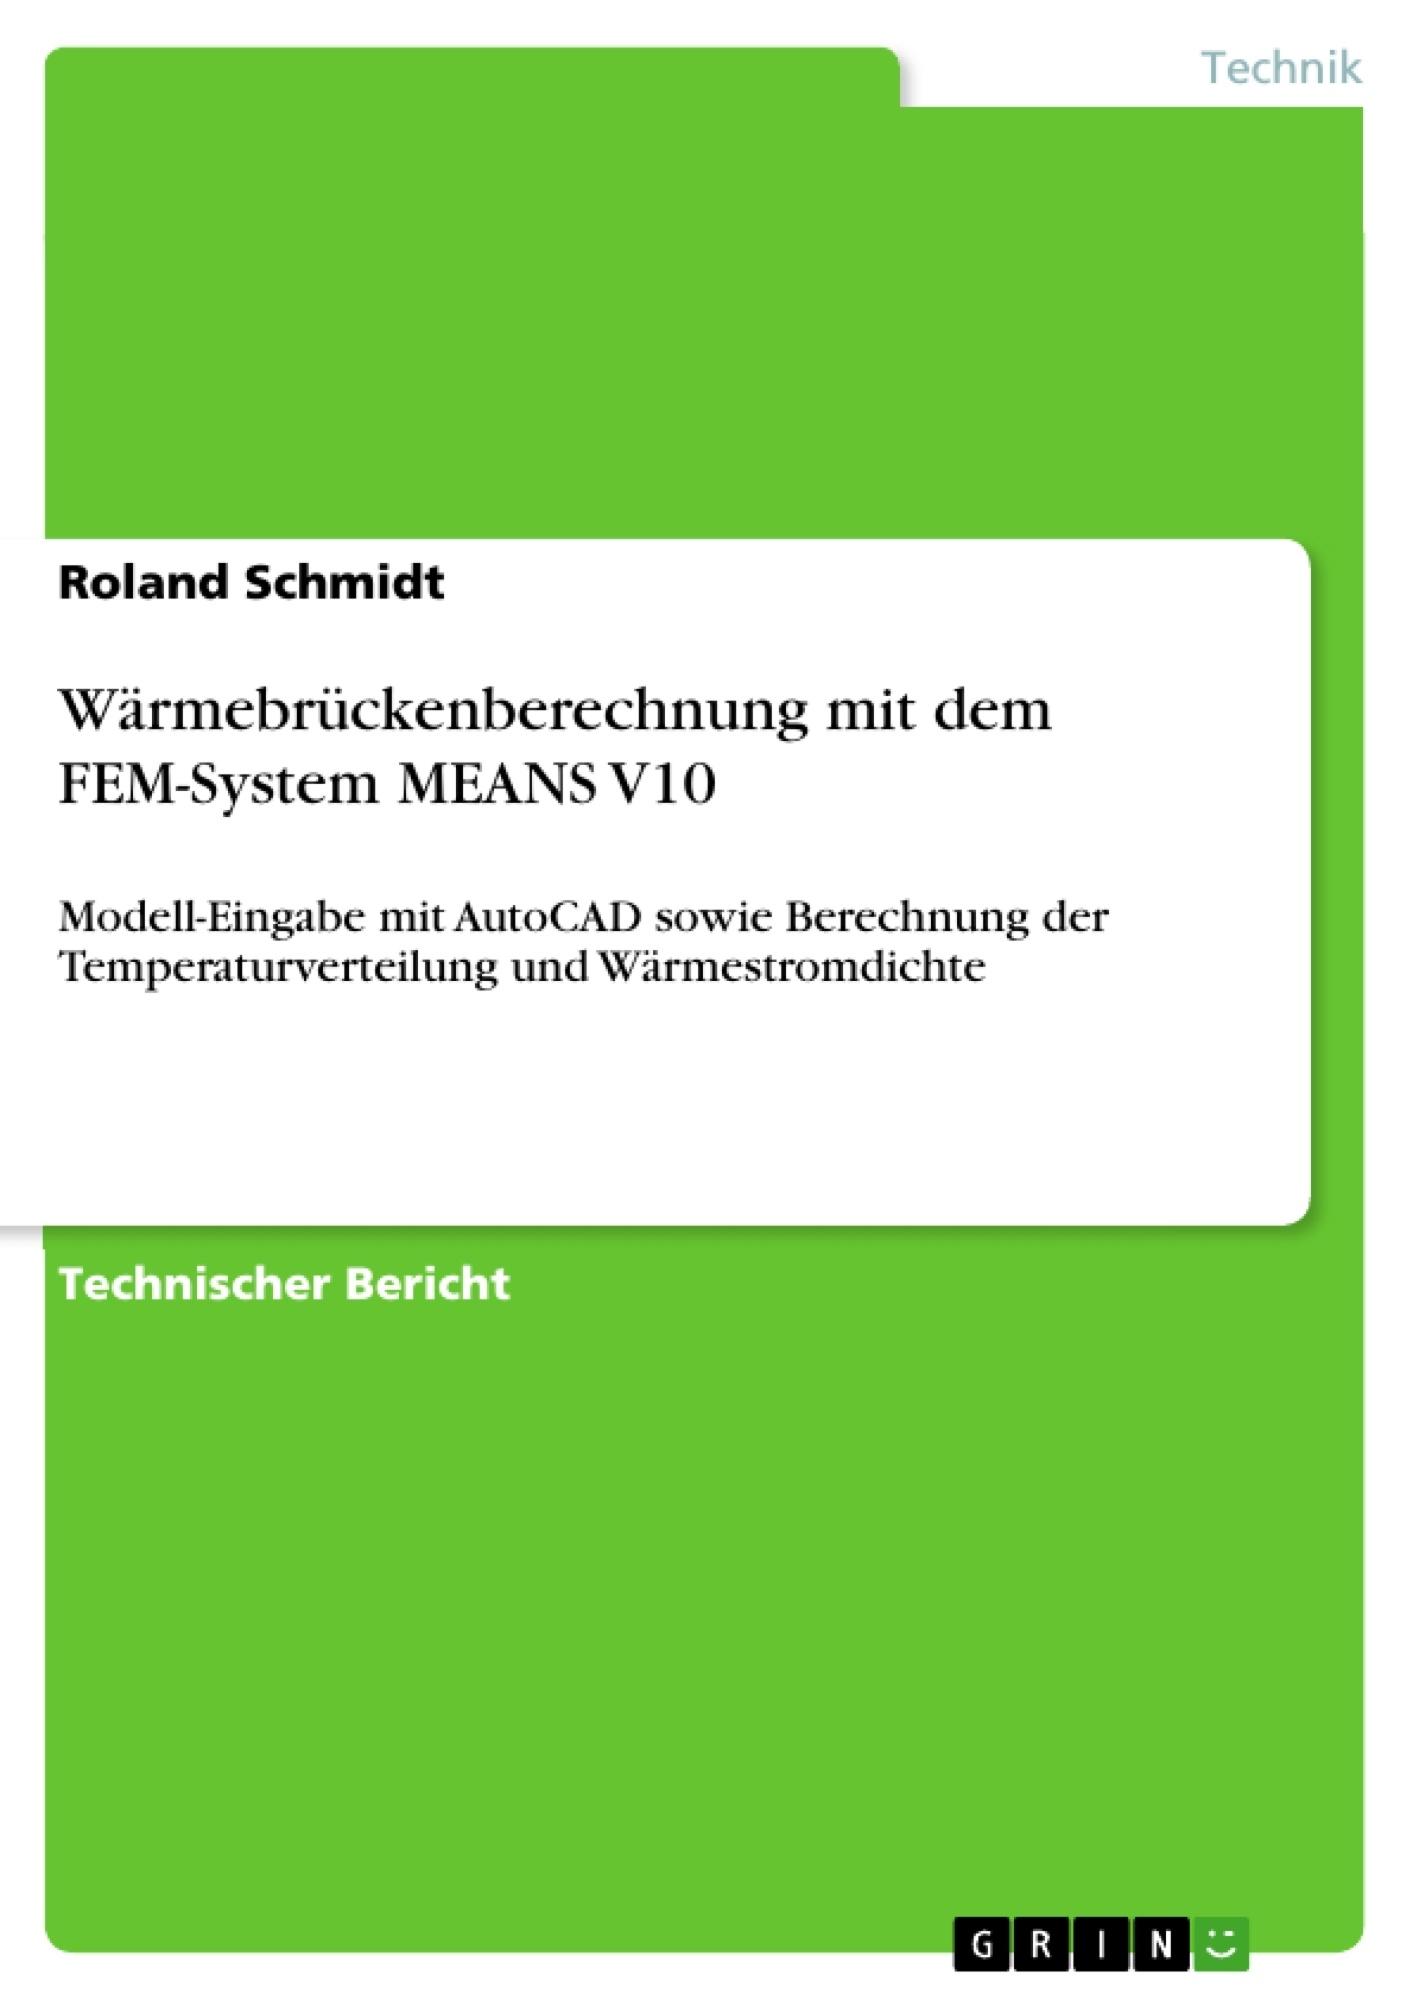 Titel: Wärmebrückenberechnung mit dem FEM-System MEANS V10